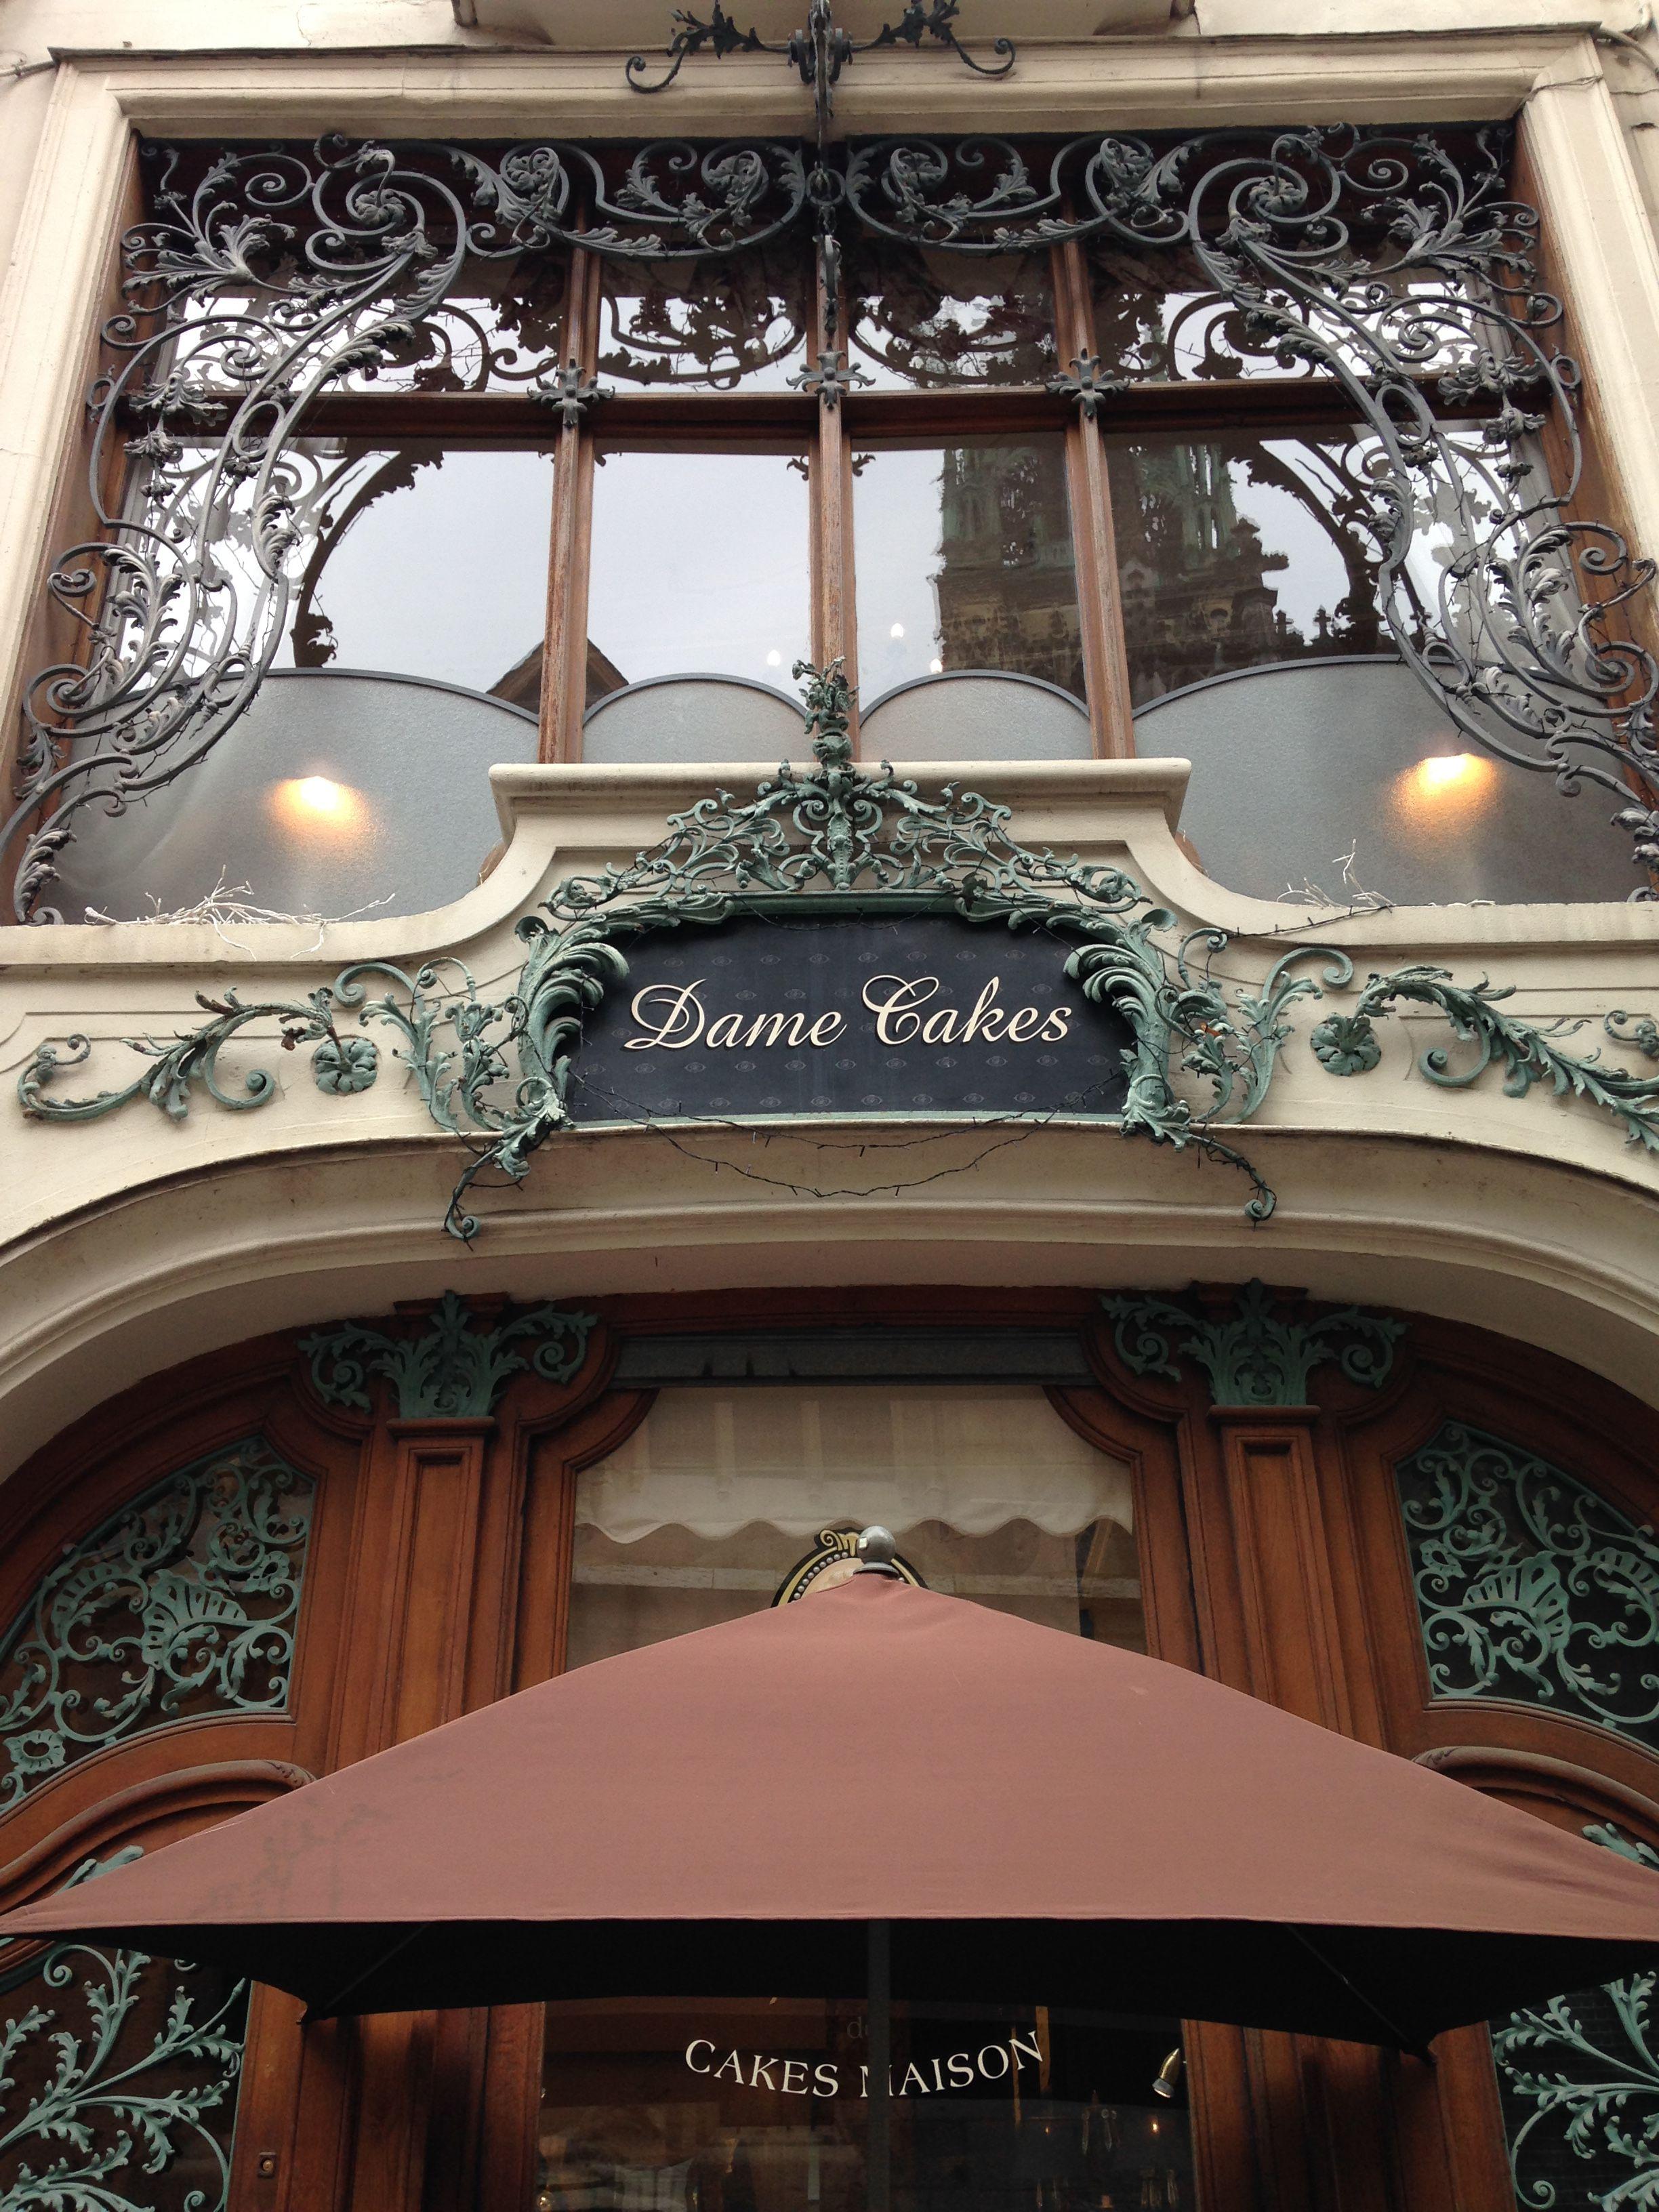 Dame Cakes, Rouen France